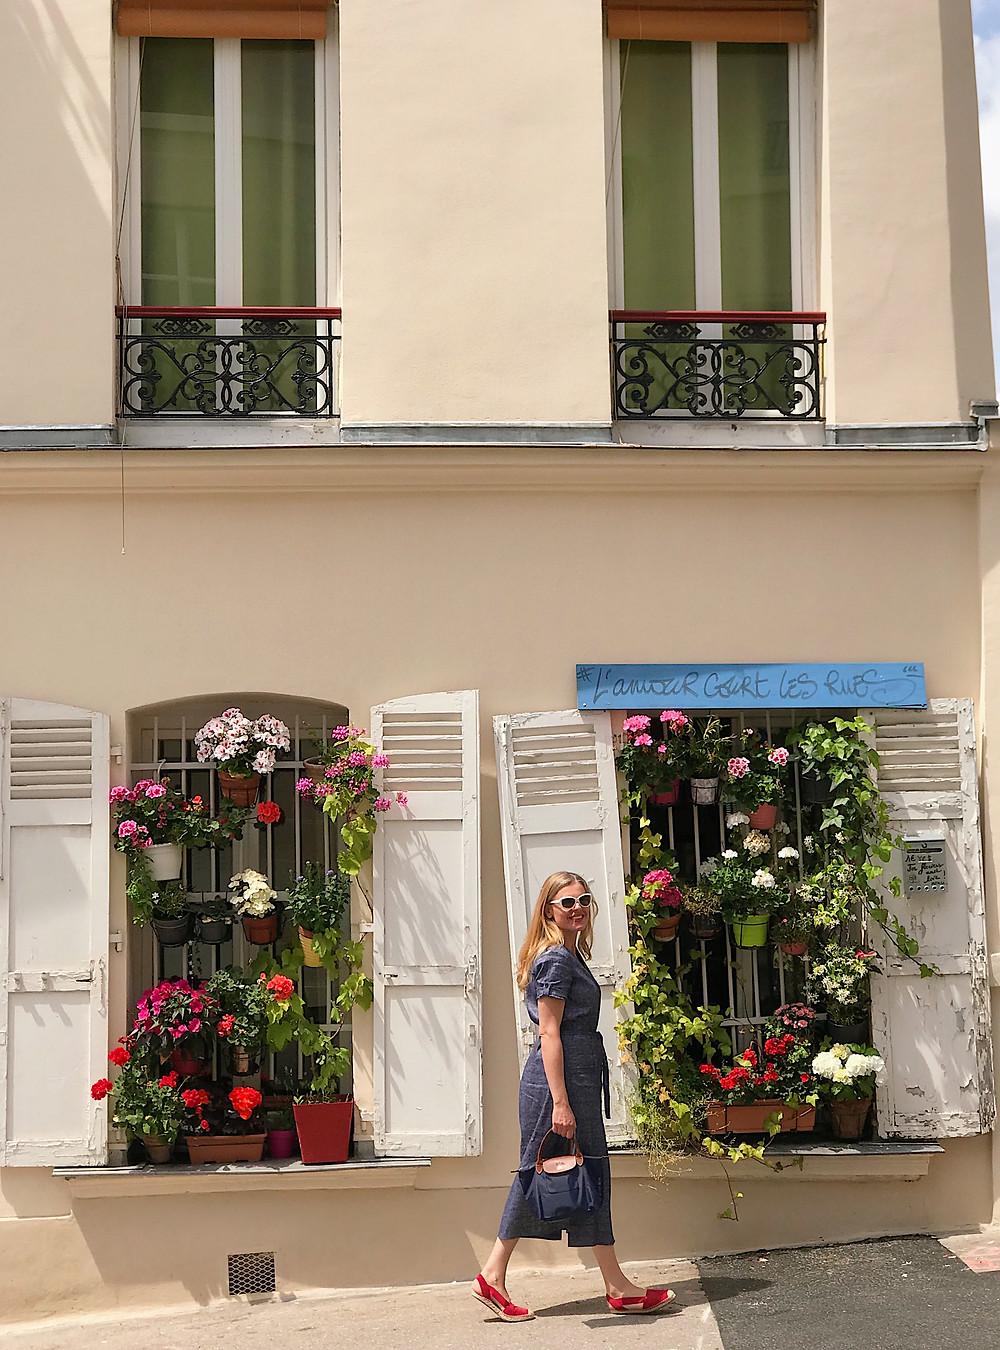 woman walking in front of windows full of flowers